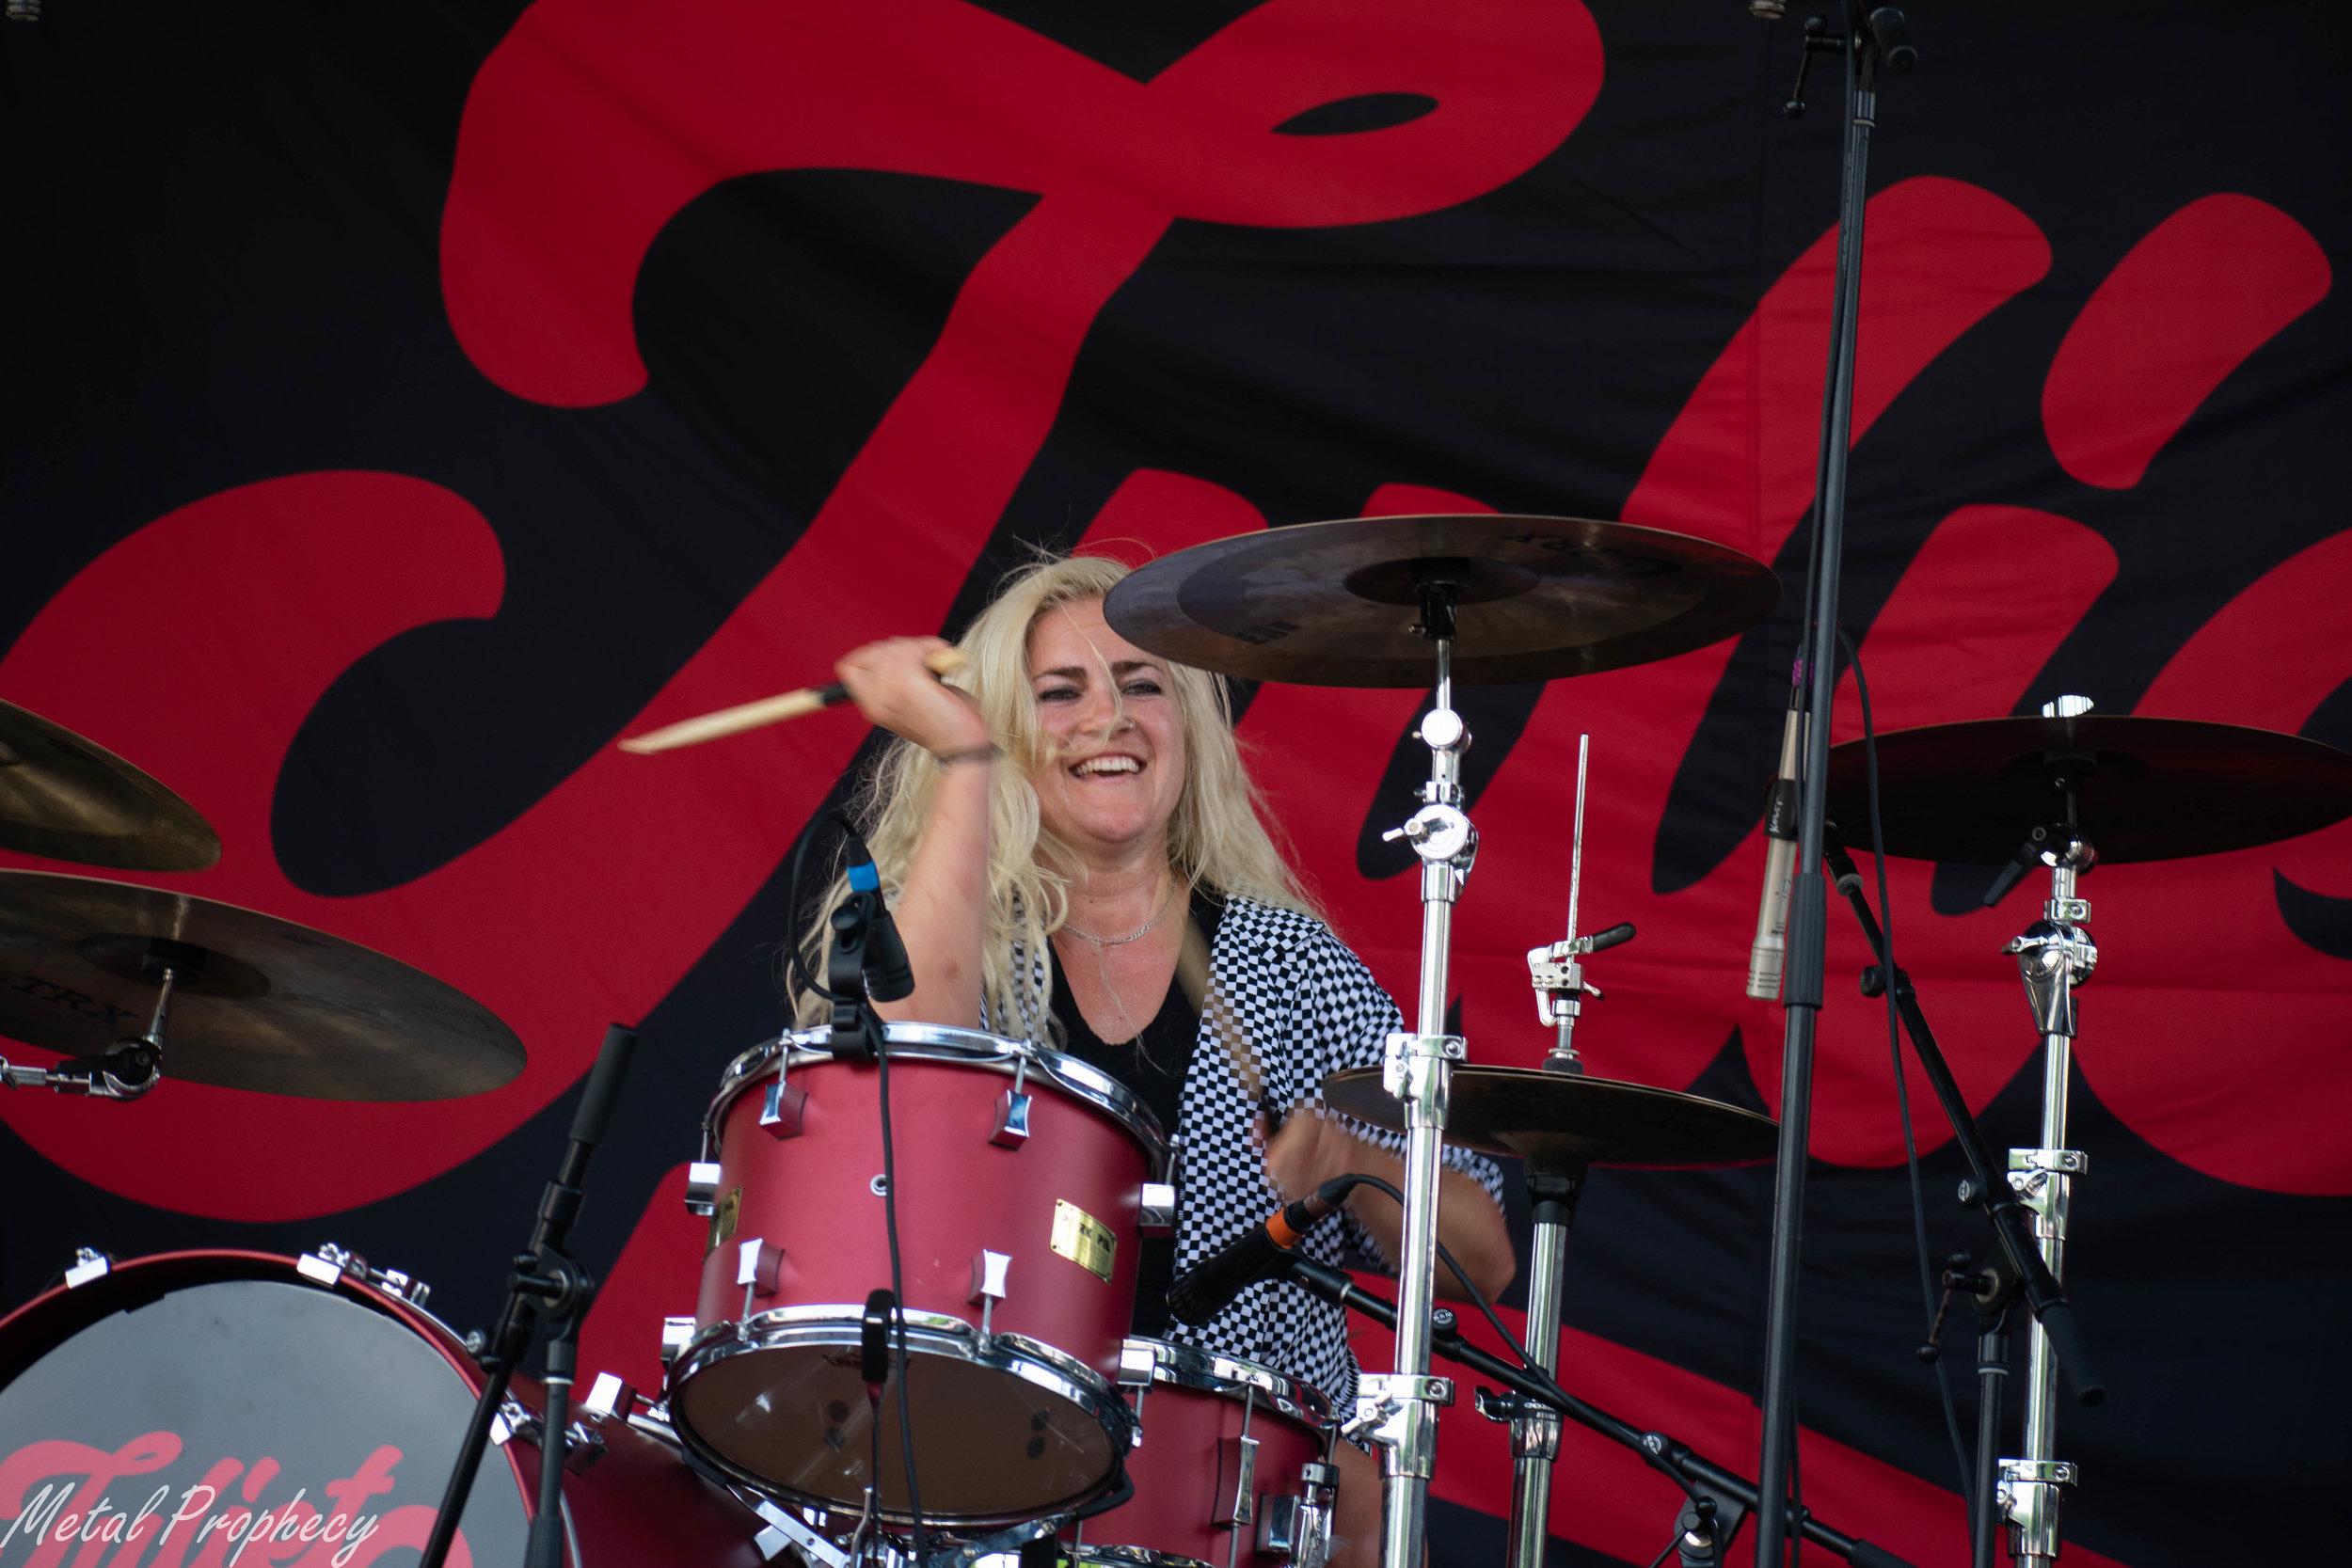 Juliet Simms at Rockstar Disrupt Festival